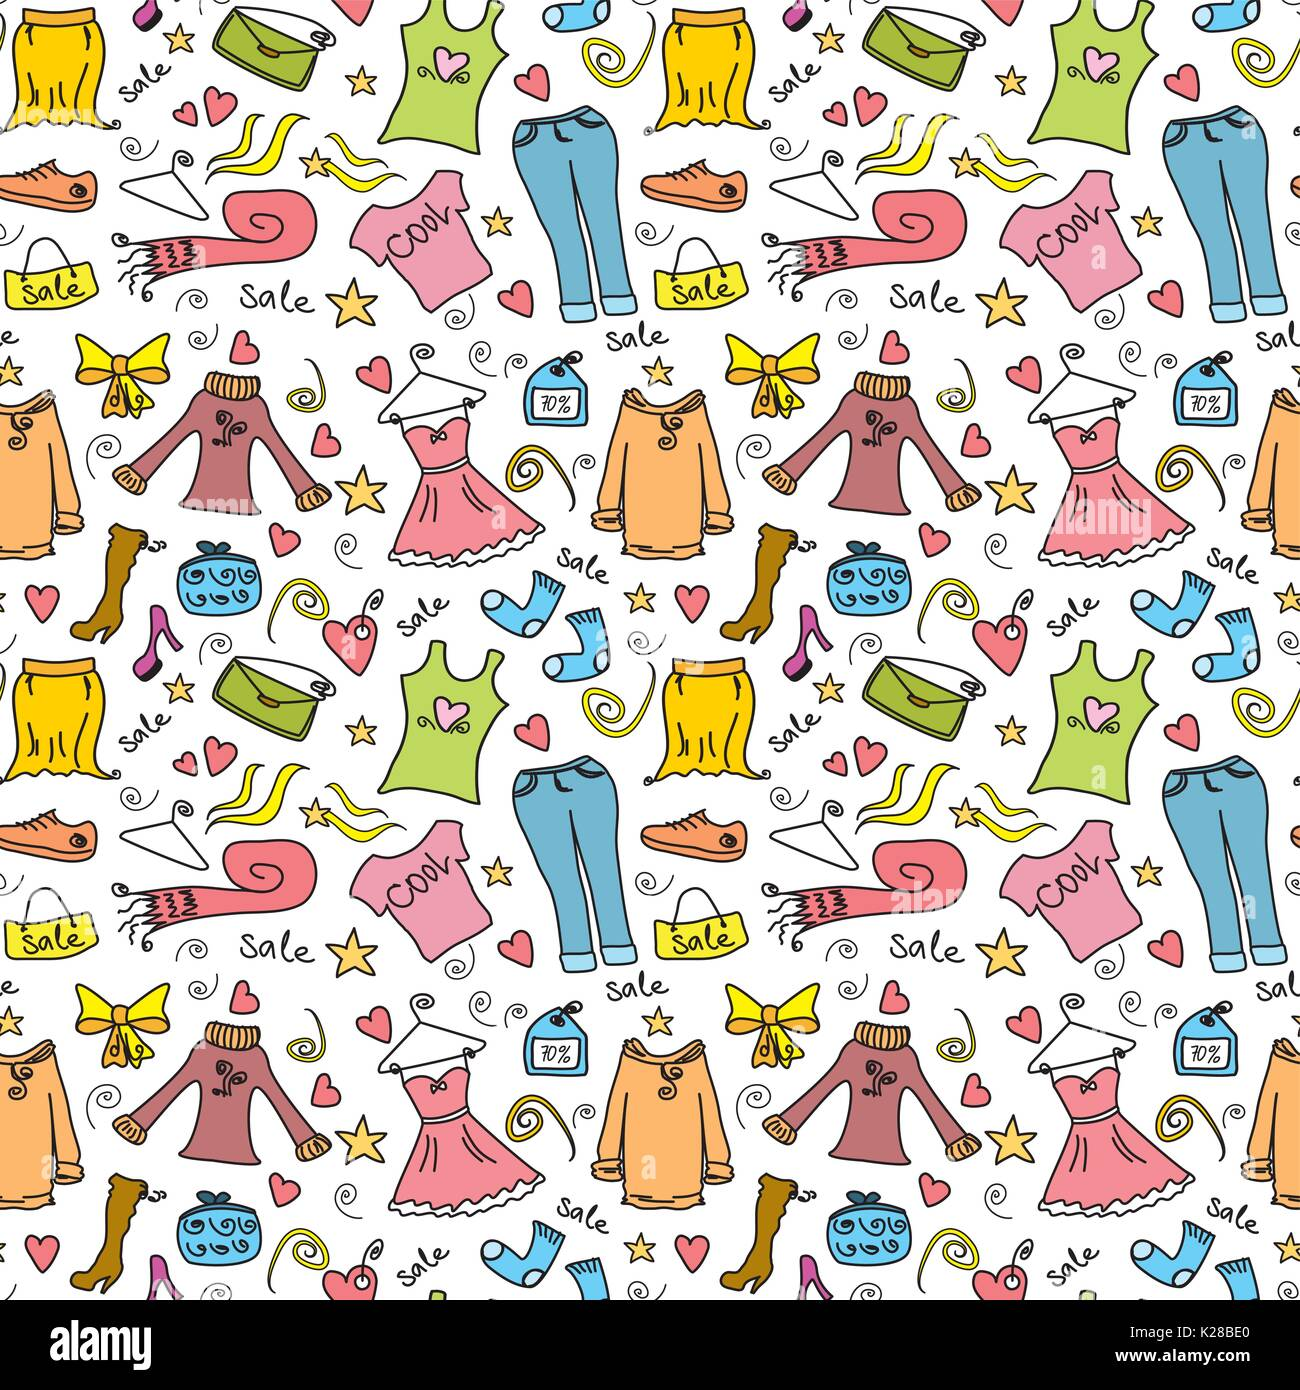 c54edfa98f3a Shopping moda seamless pattern